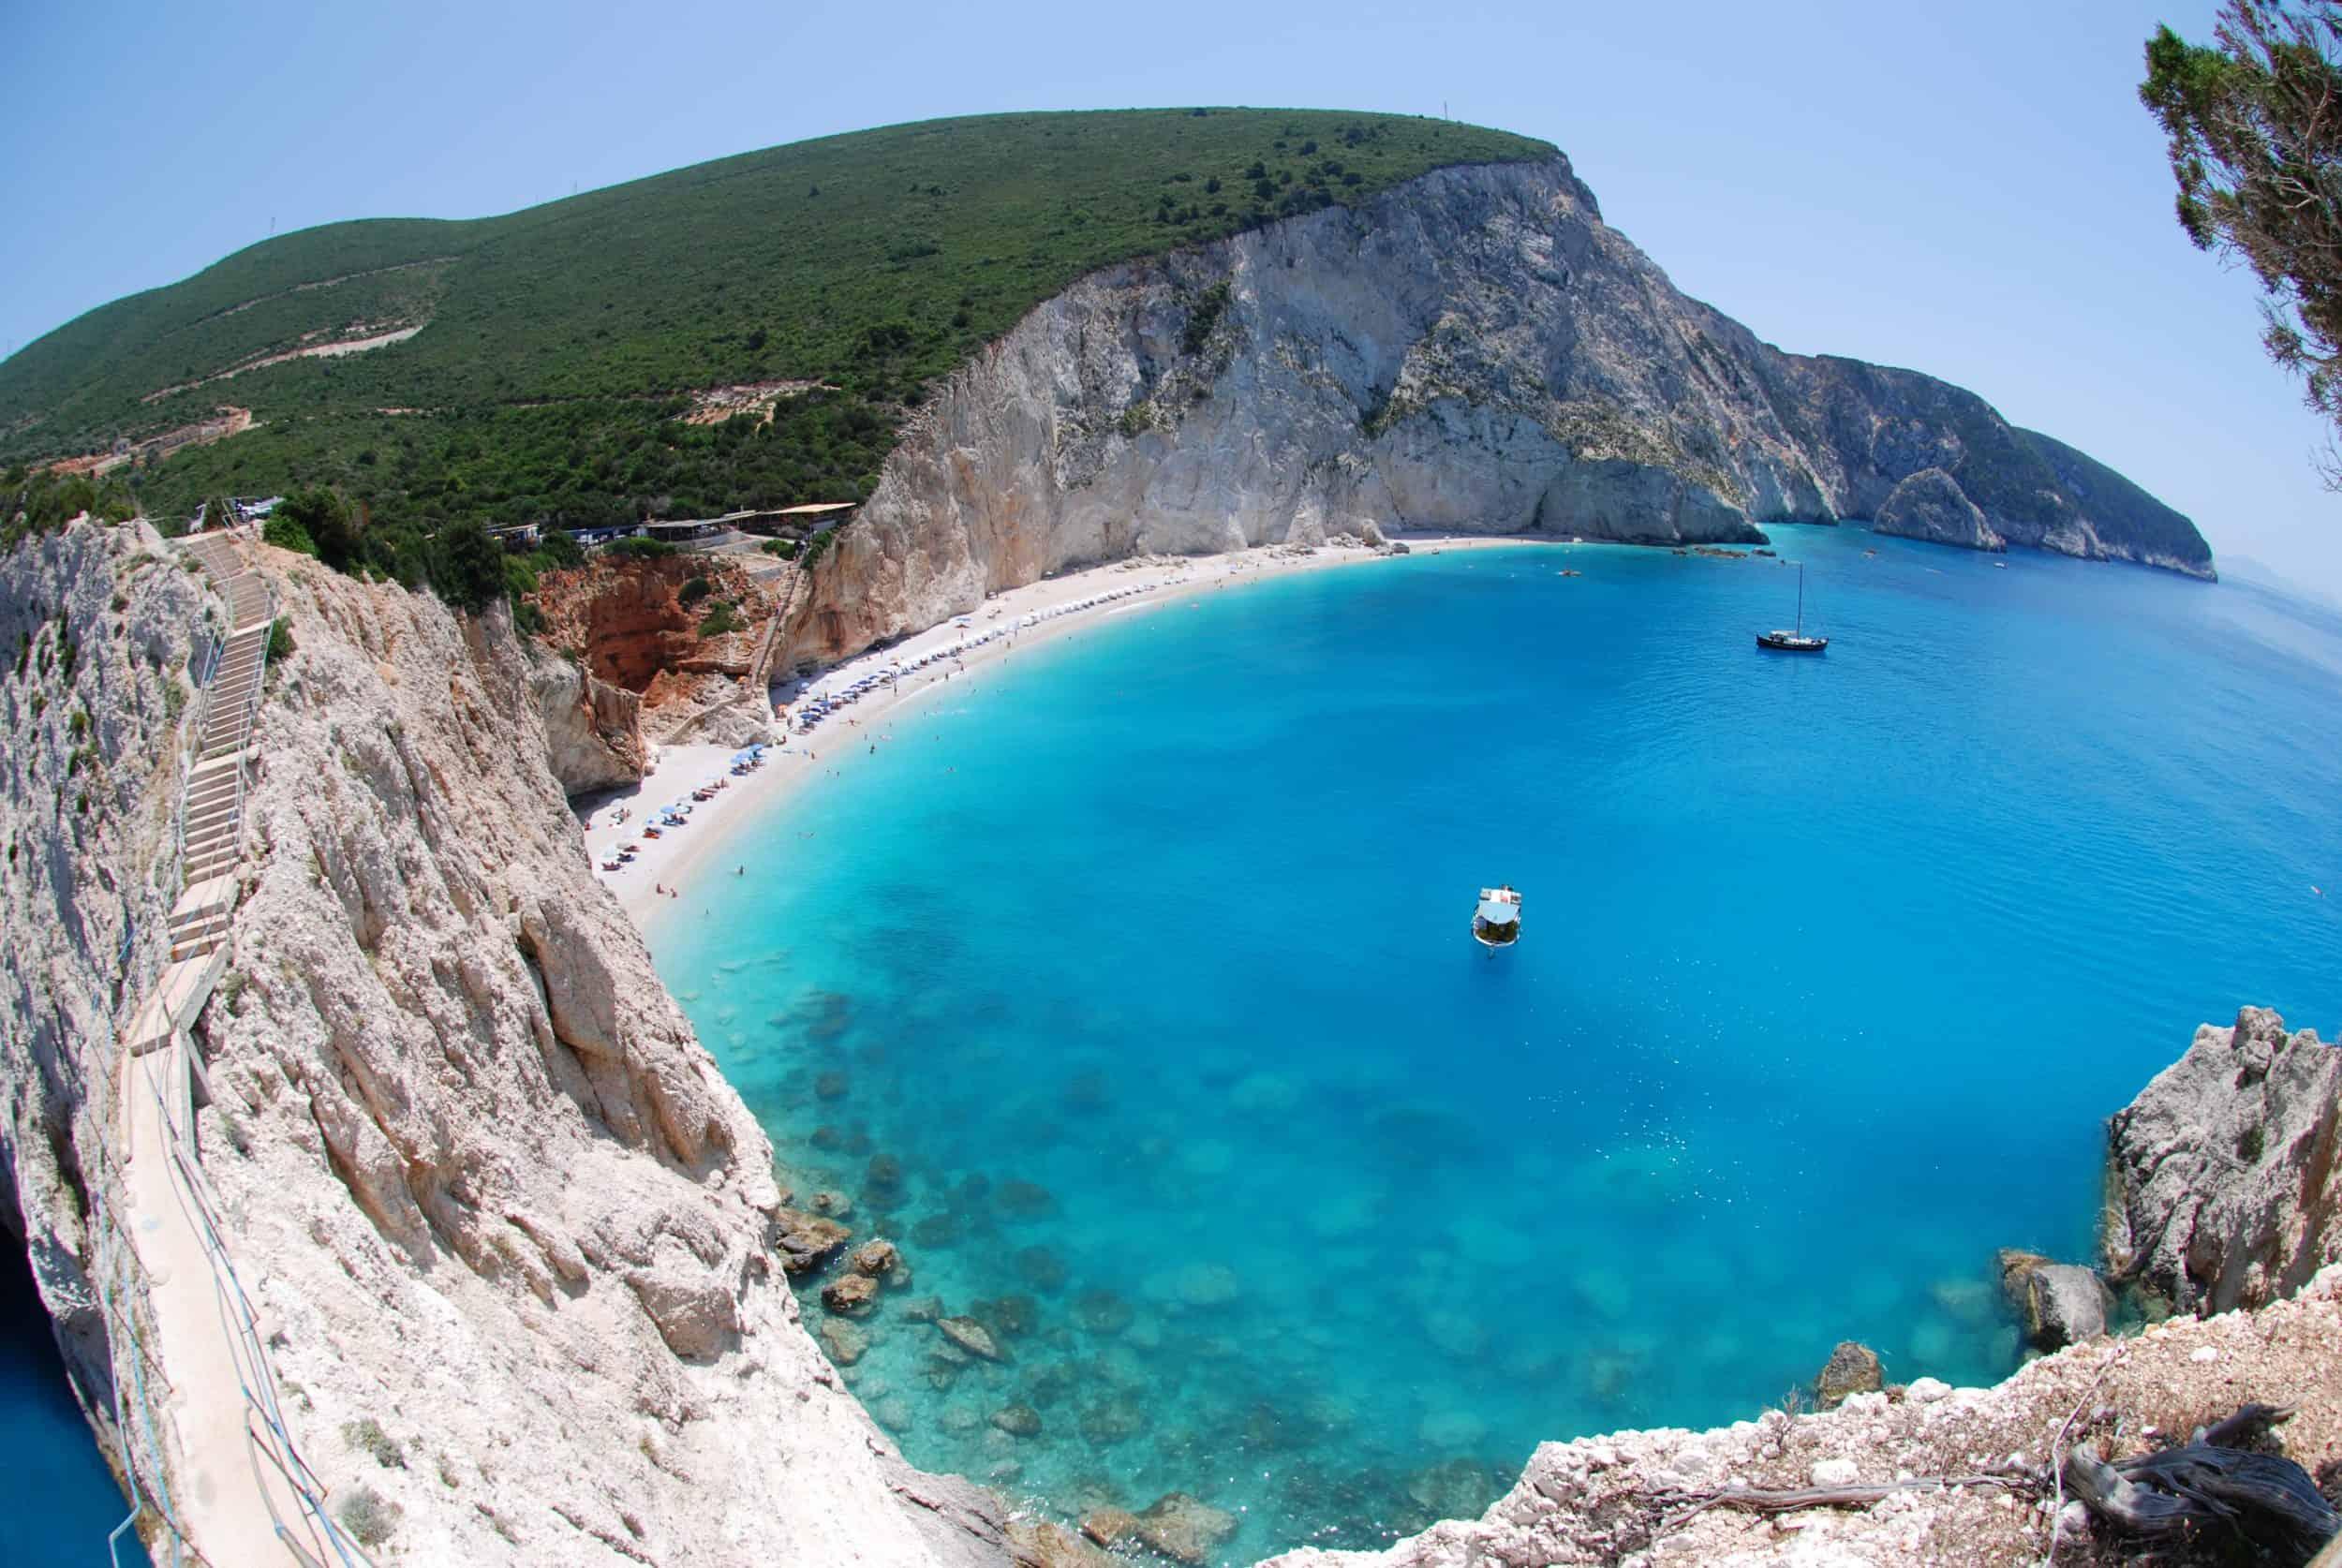 Vacanze a vela in grecia ionica una settimana di vacanze for Grecia vacanze